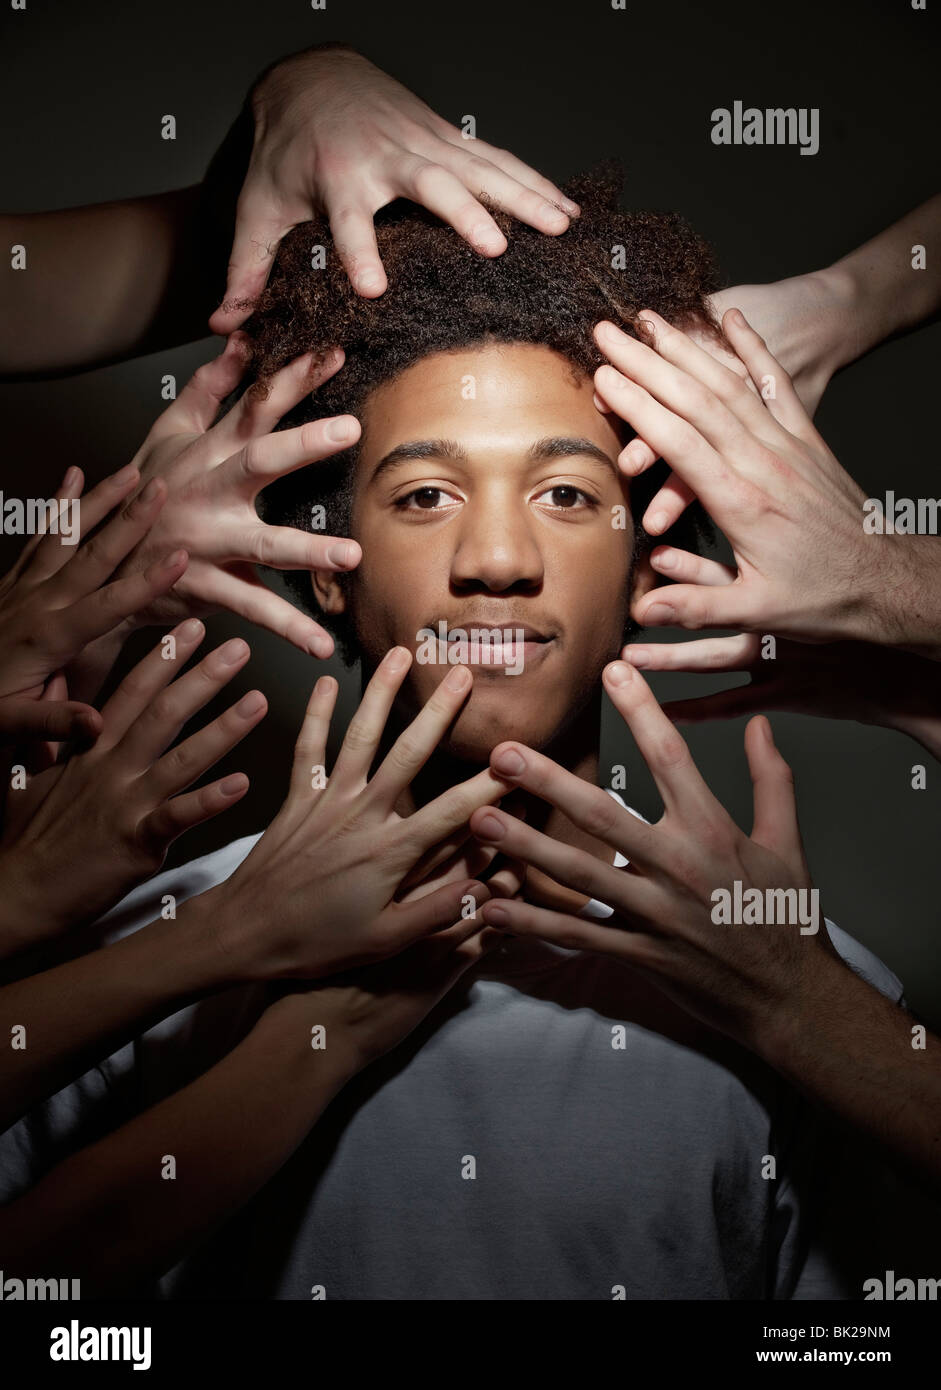 Macho negro rodeado de manos Imagen De Stock